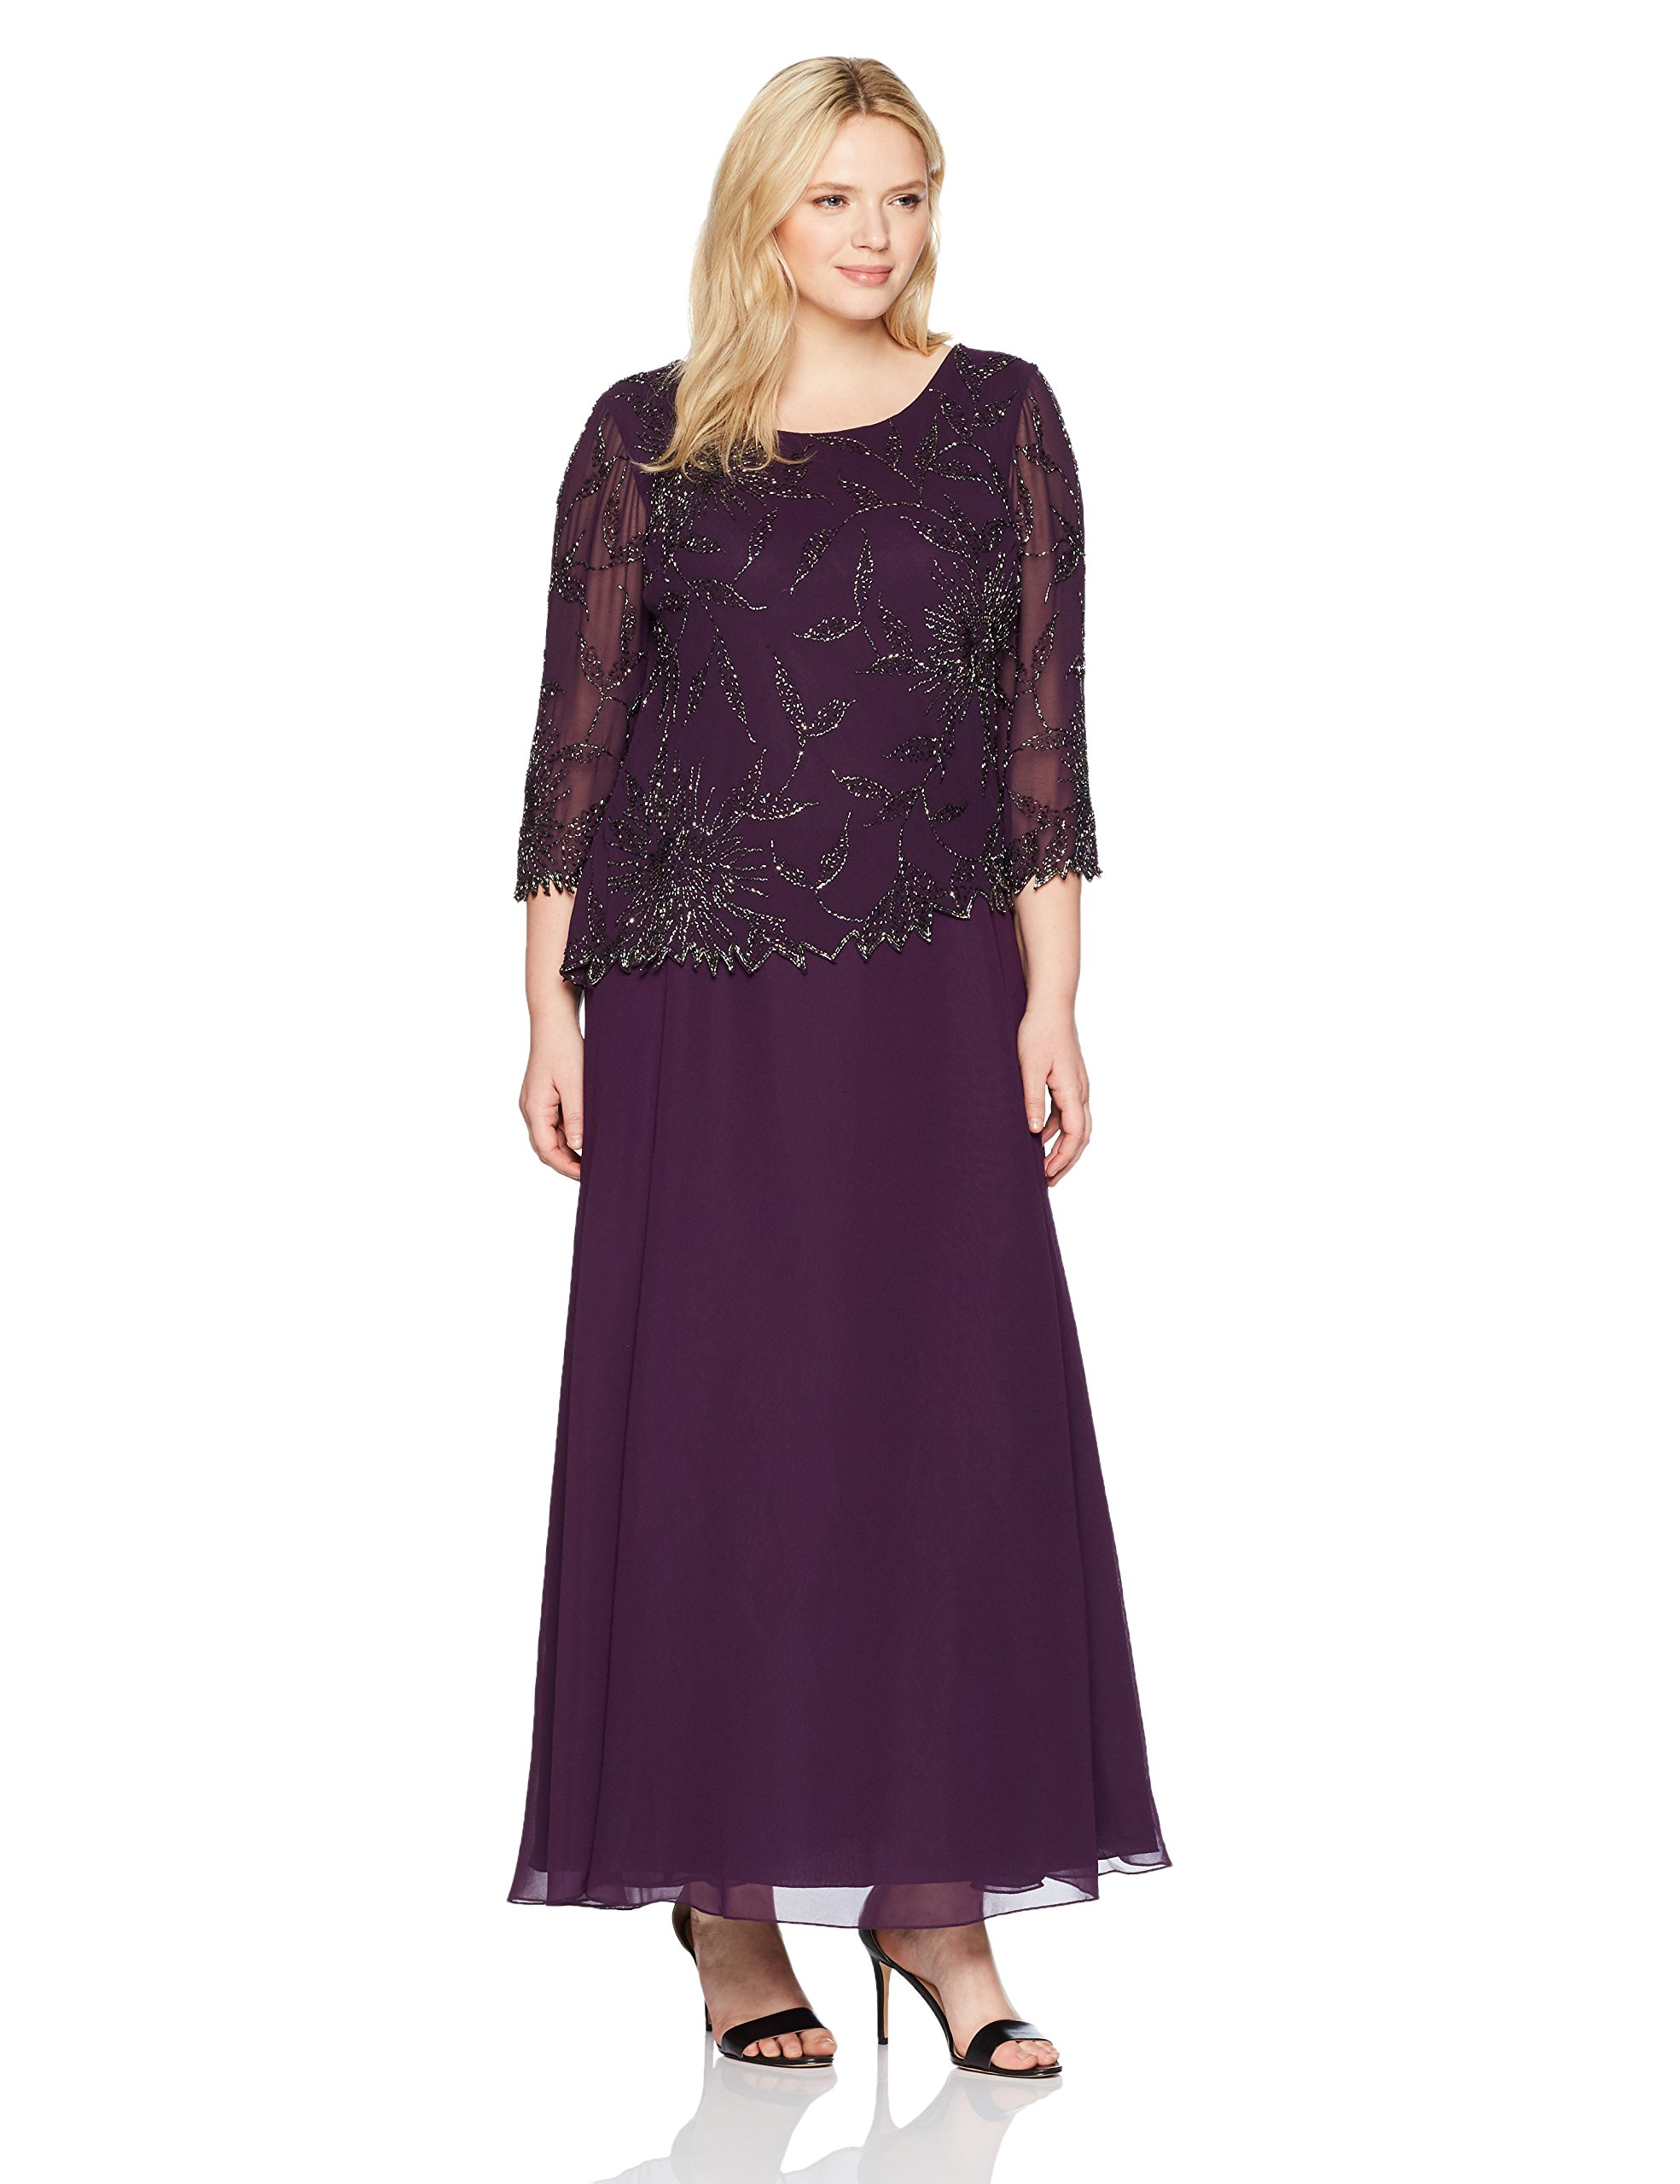 J Kara Women\'s Plus Size Long Scoop Neck Asymetrical Beaded Dress,  Plum/Shaded/Mercury, 18W